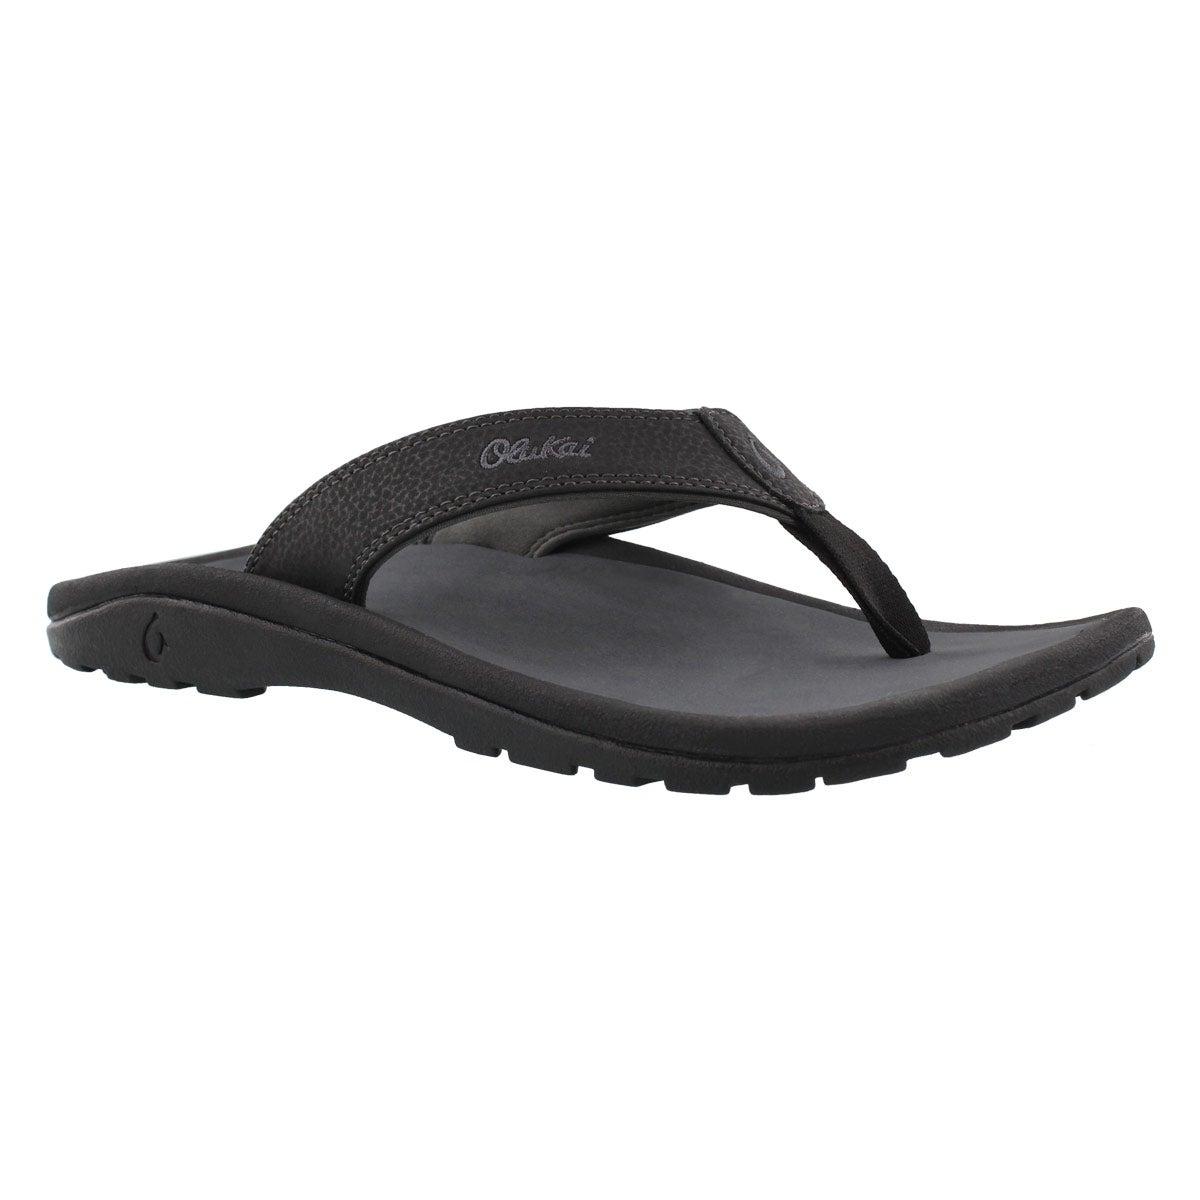 Men's OHANA black/shadow thong sandals